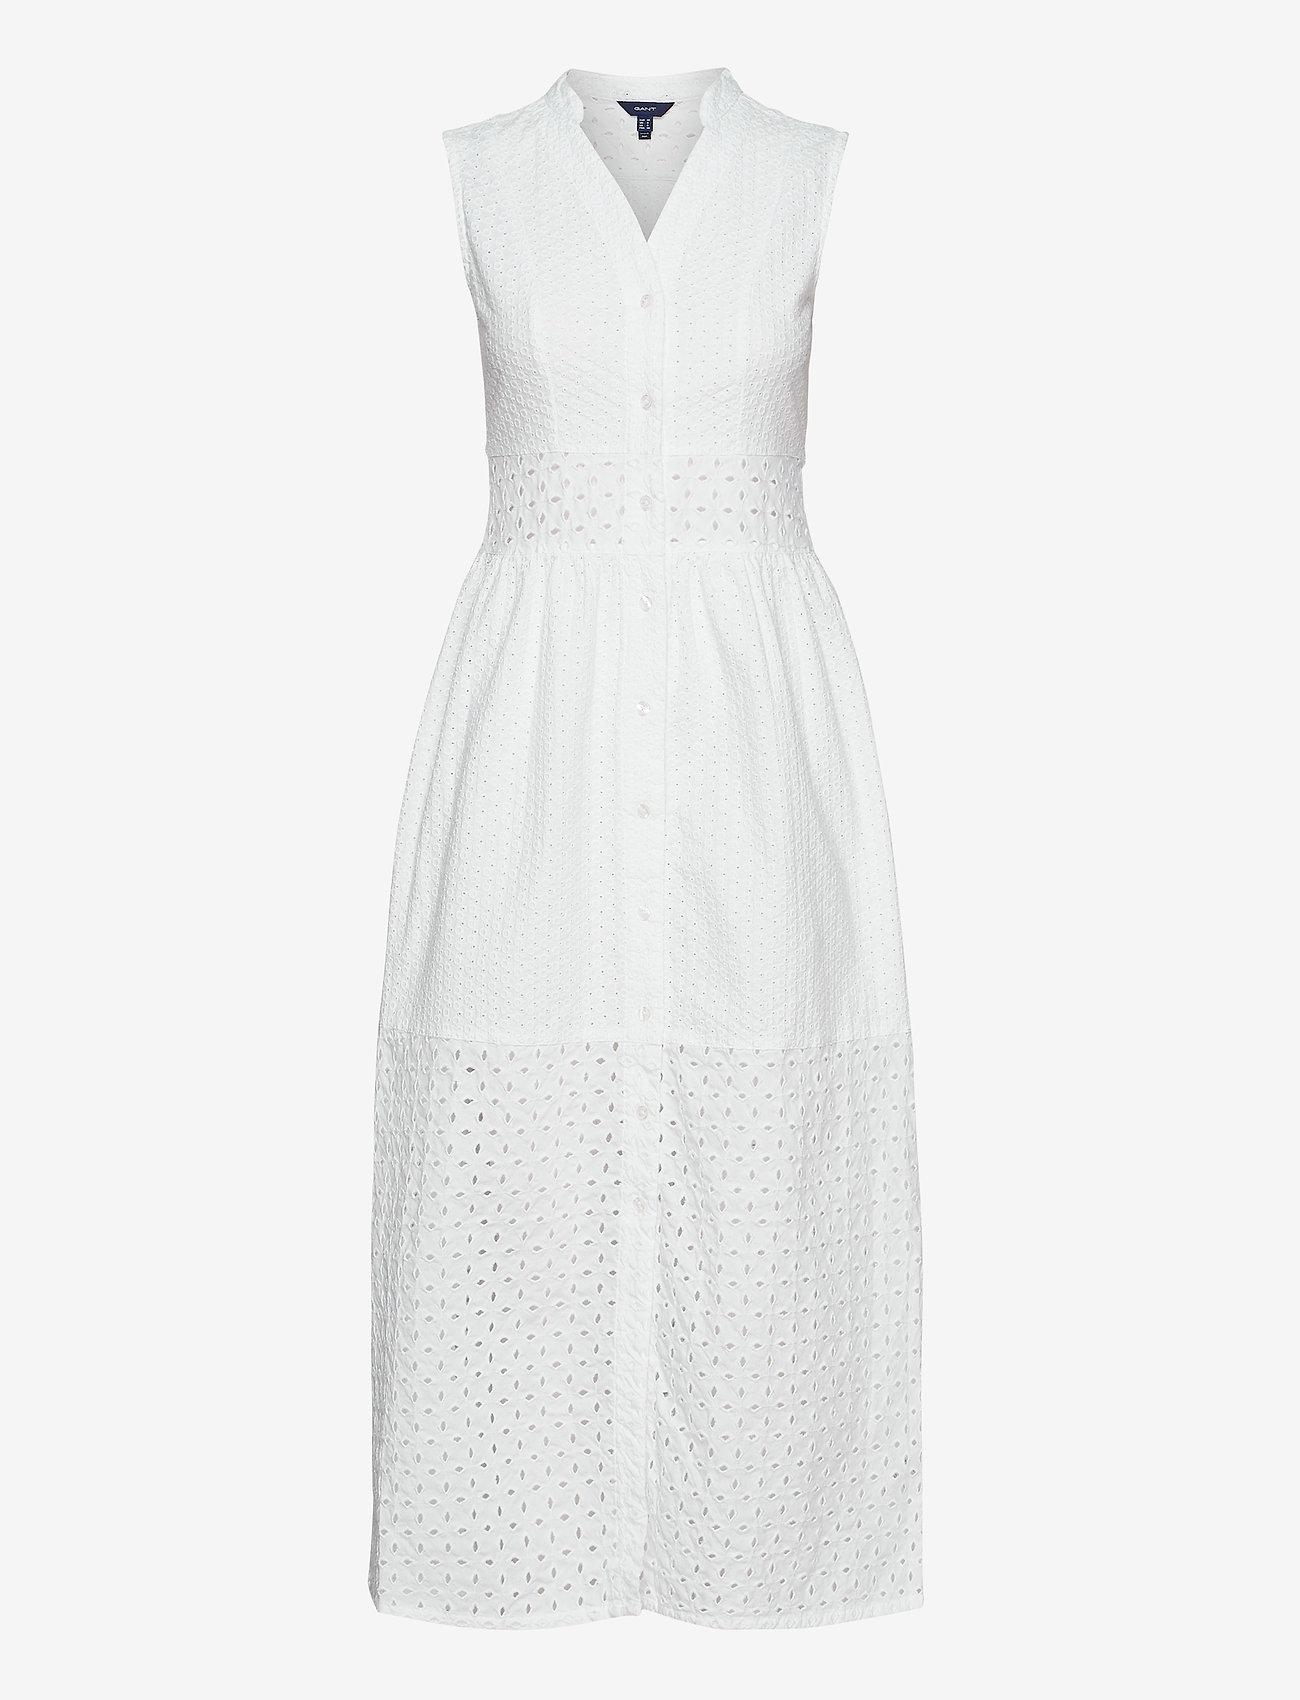 GANT - D1. BRODERIE ANGLAISE MAXI DRESS - midi dresses - white - 0